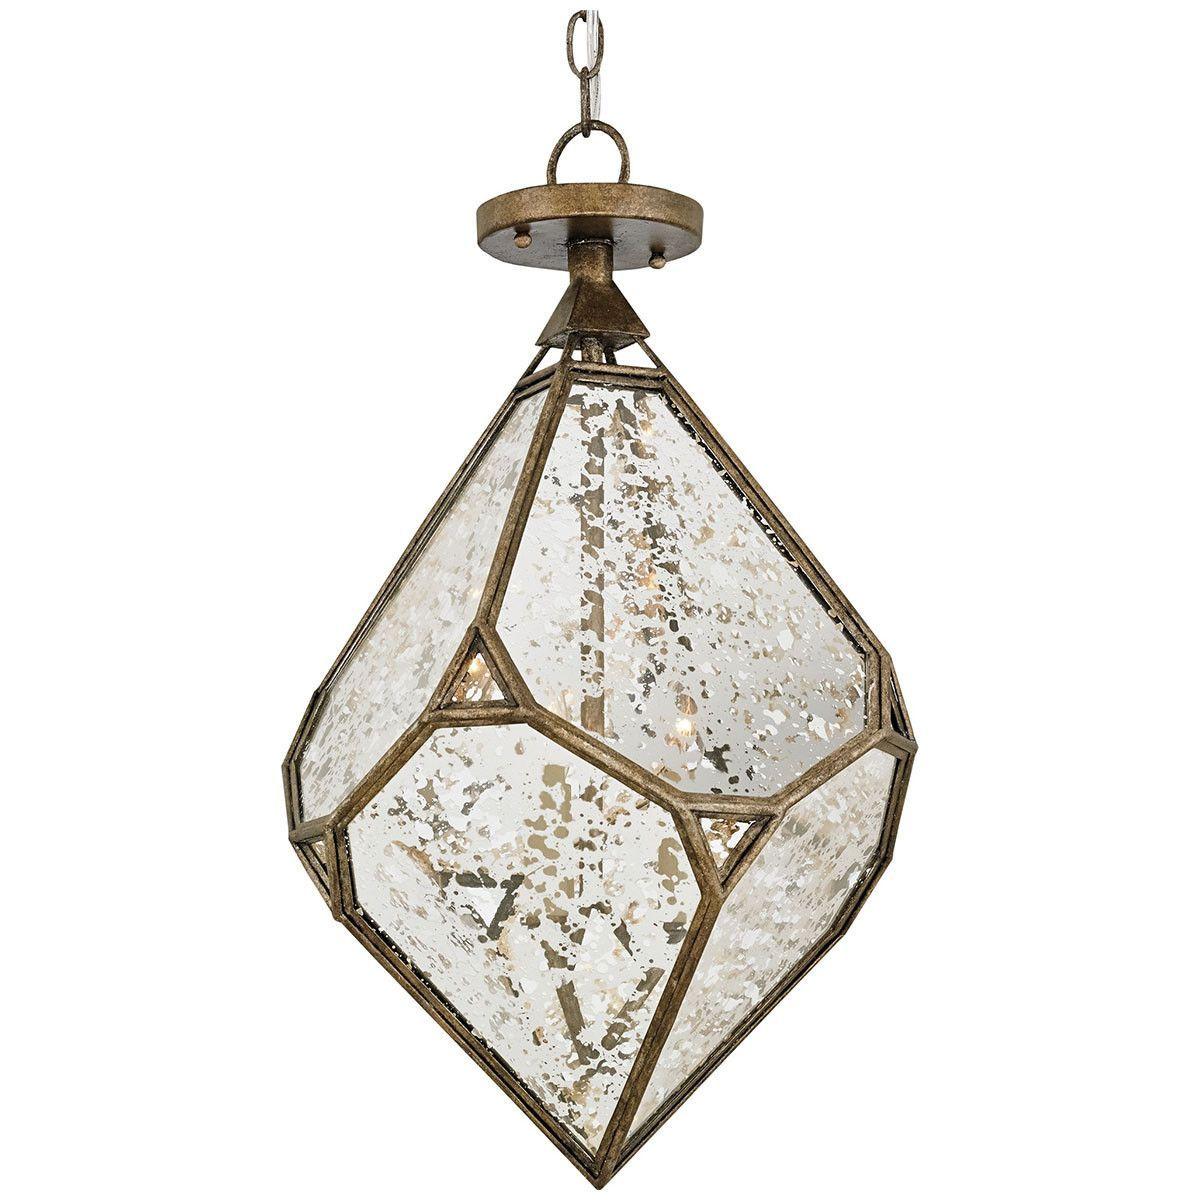 Currey and company glace pyrite bronze raj mirror chandelier la currey and company glace pyrite bronze raj mirror chandelier arubaitofo Gallery